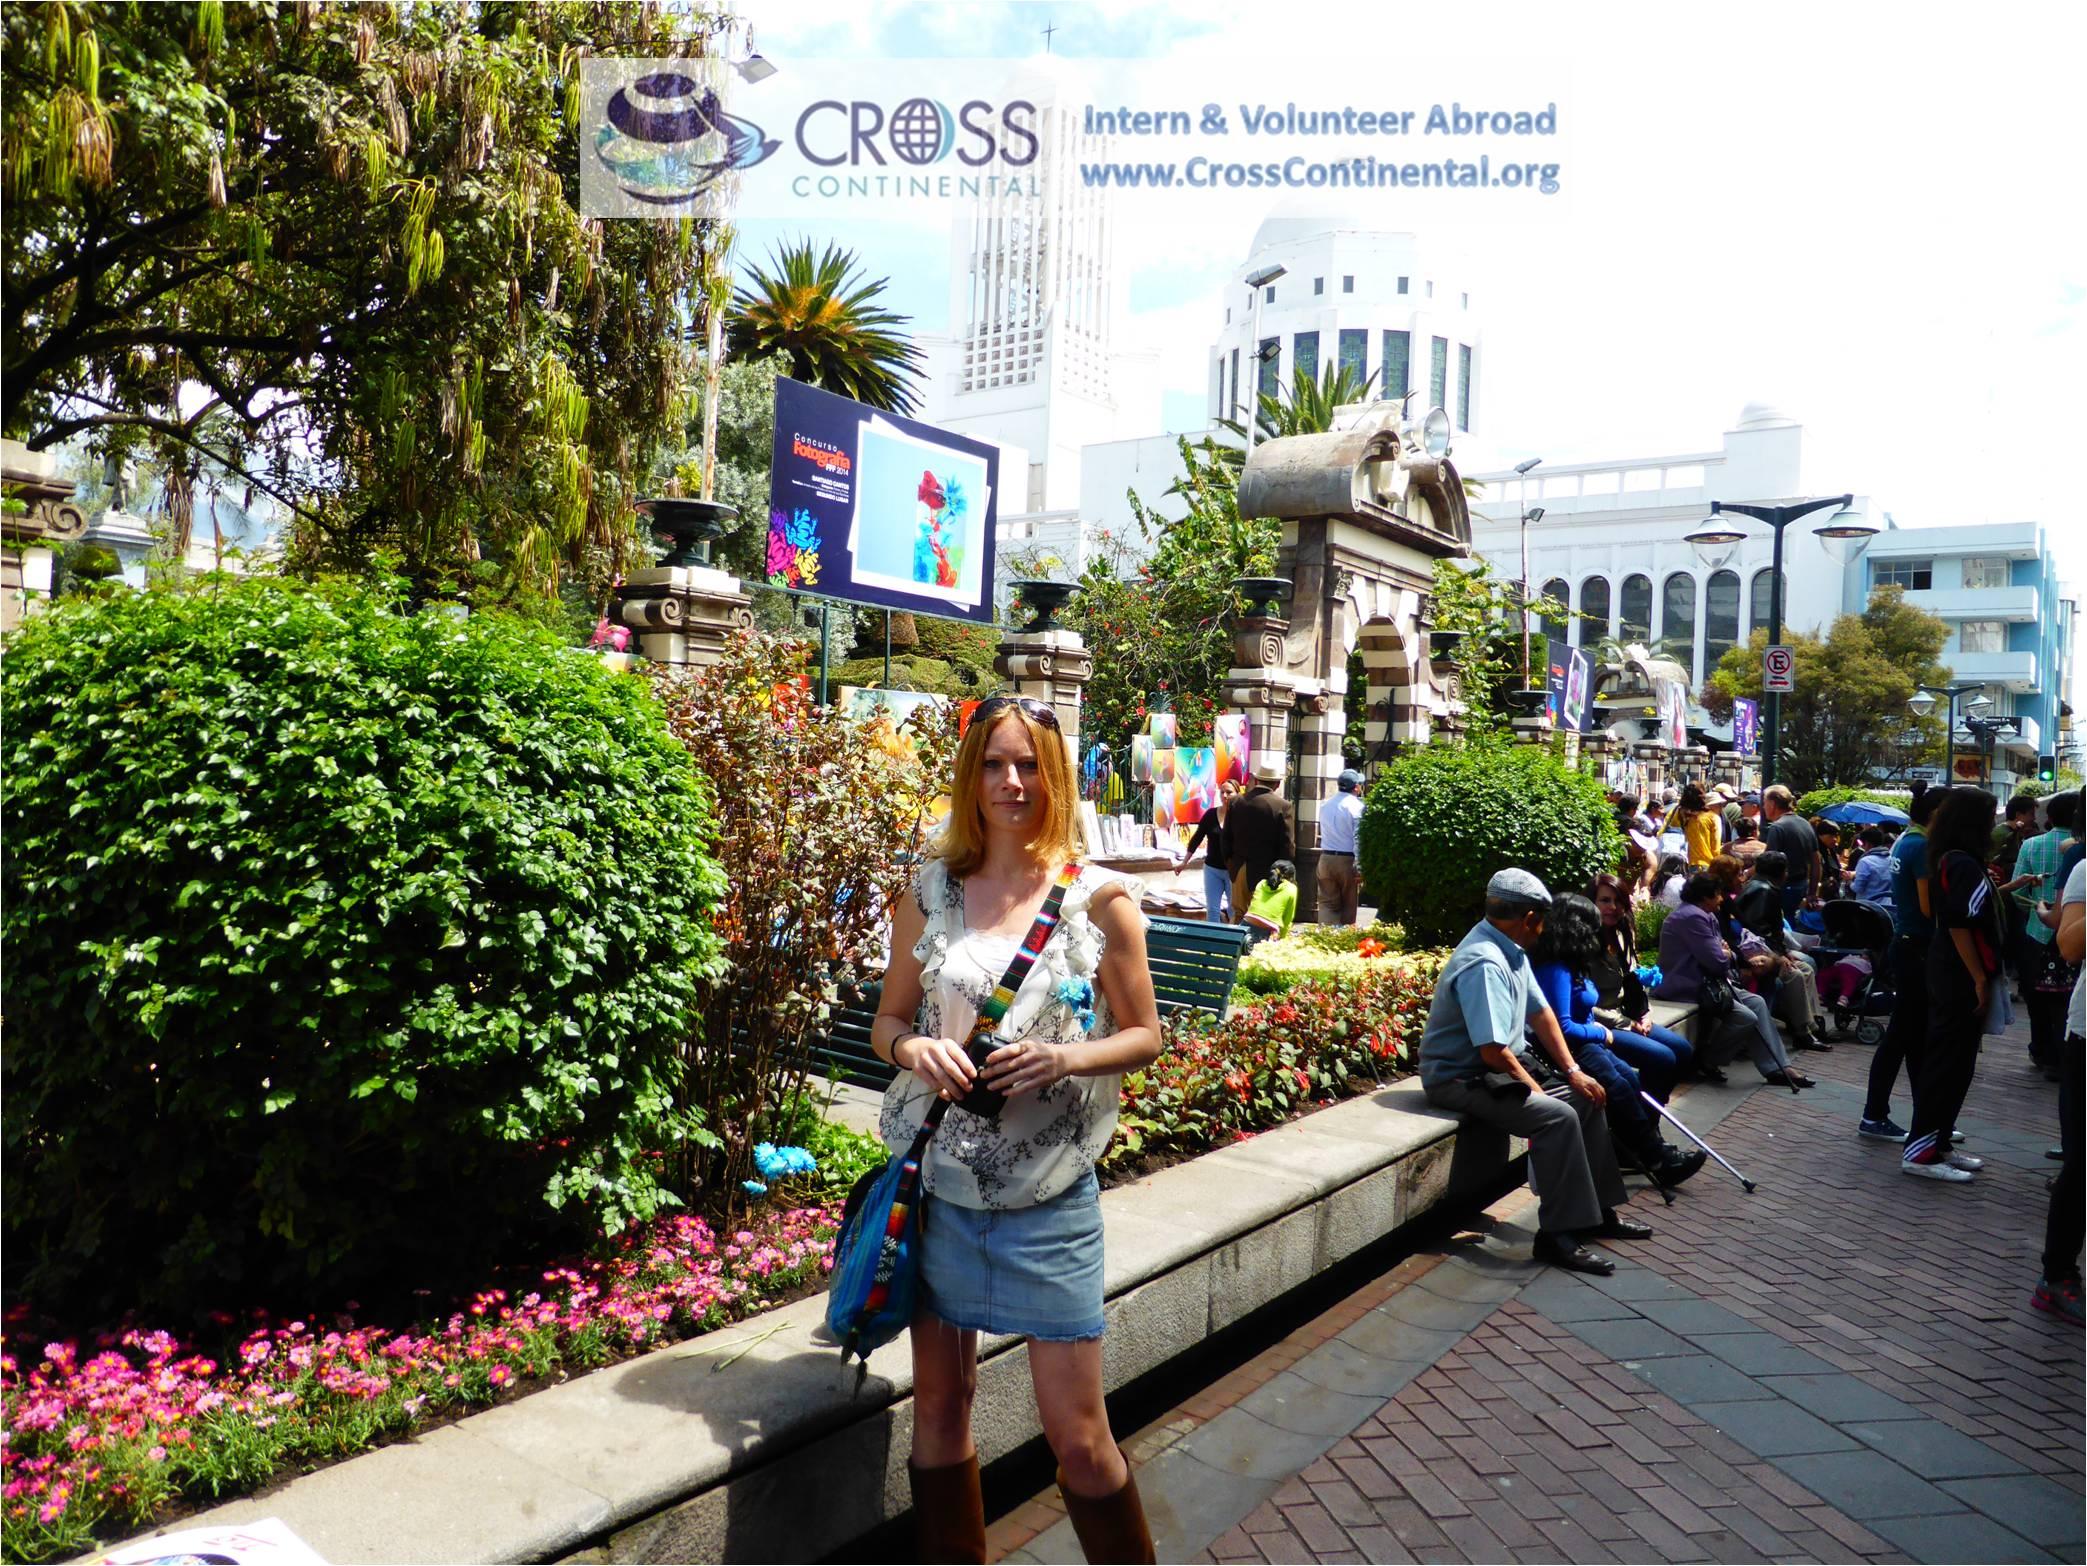 Street Children Project Abroad Intern Or Volunteer